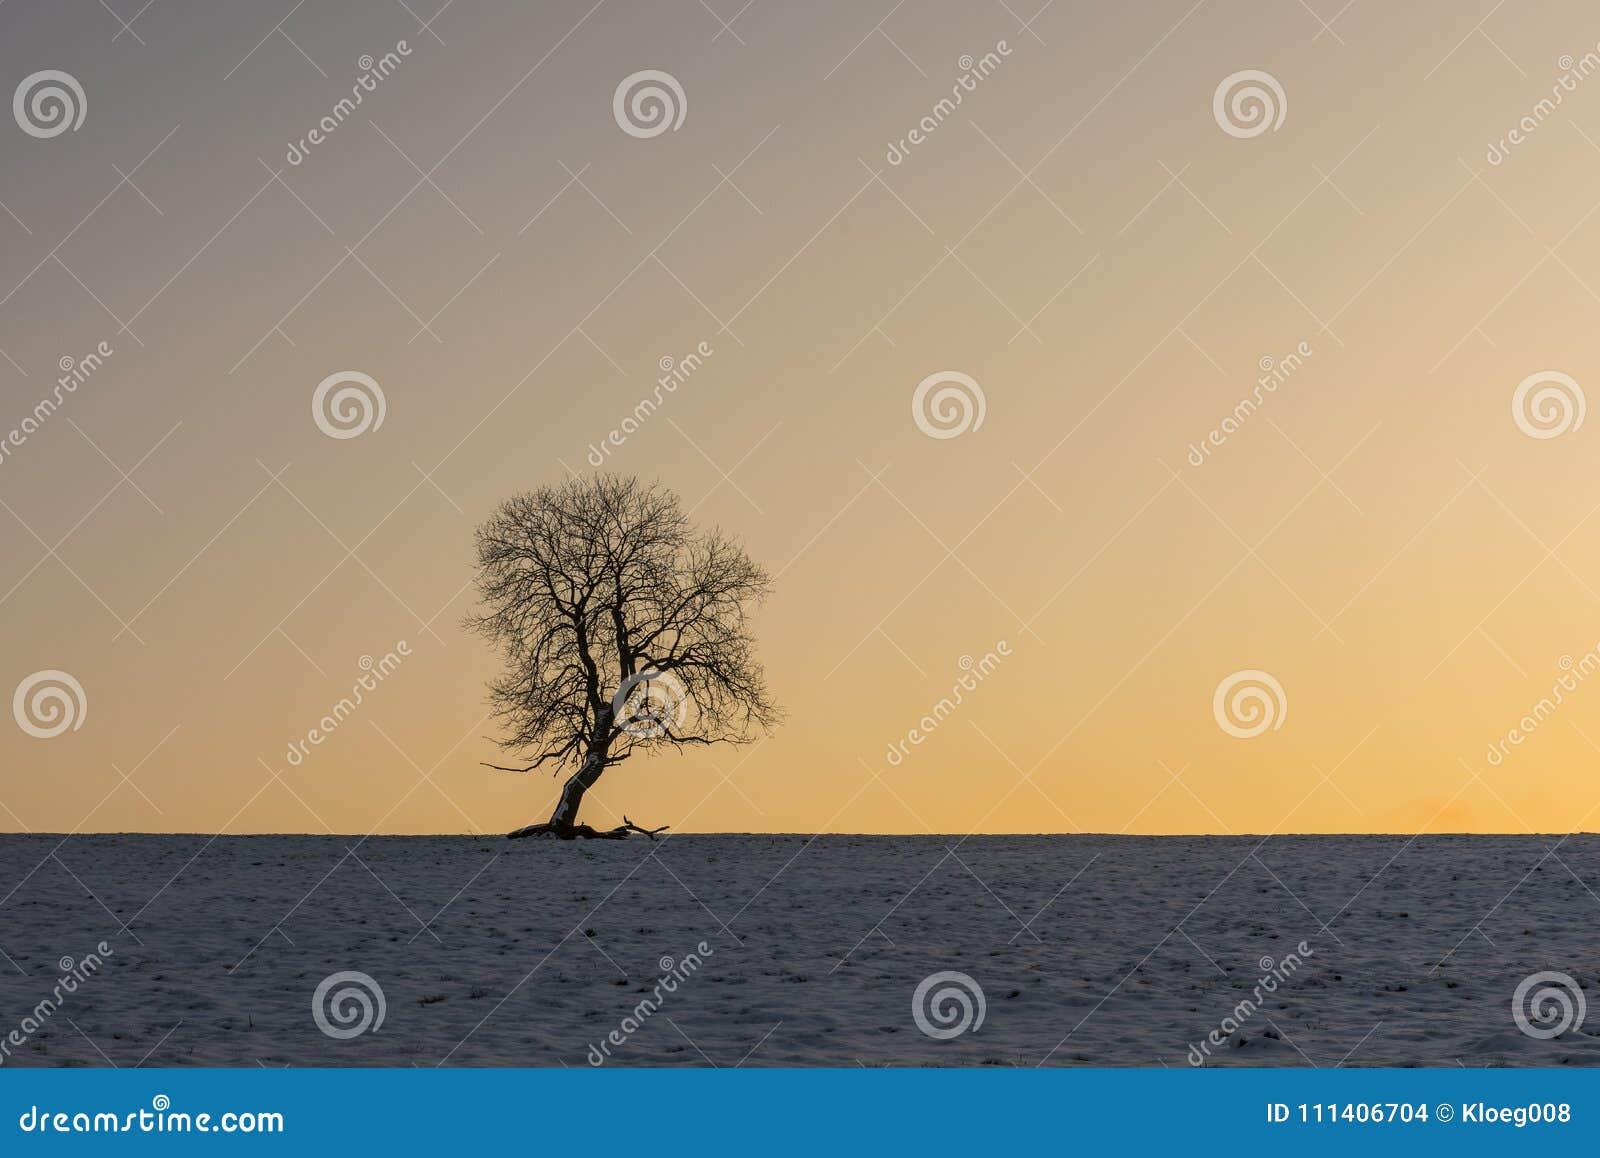 Winter Tree In Benneckenstein In Germany Stock Photo ...